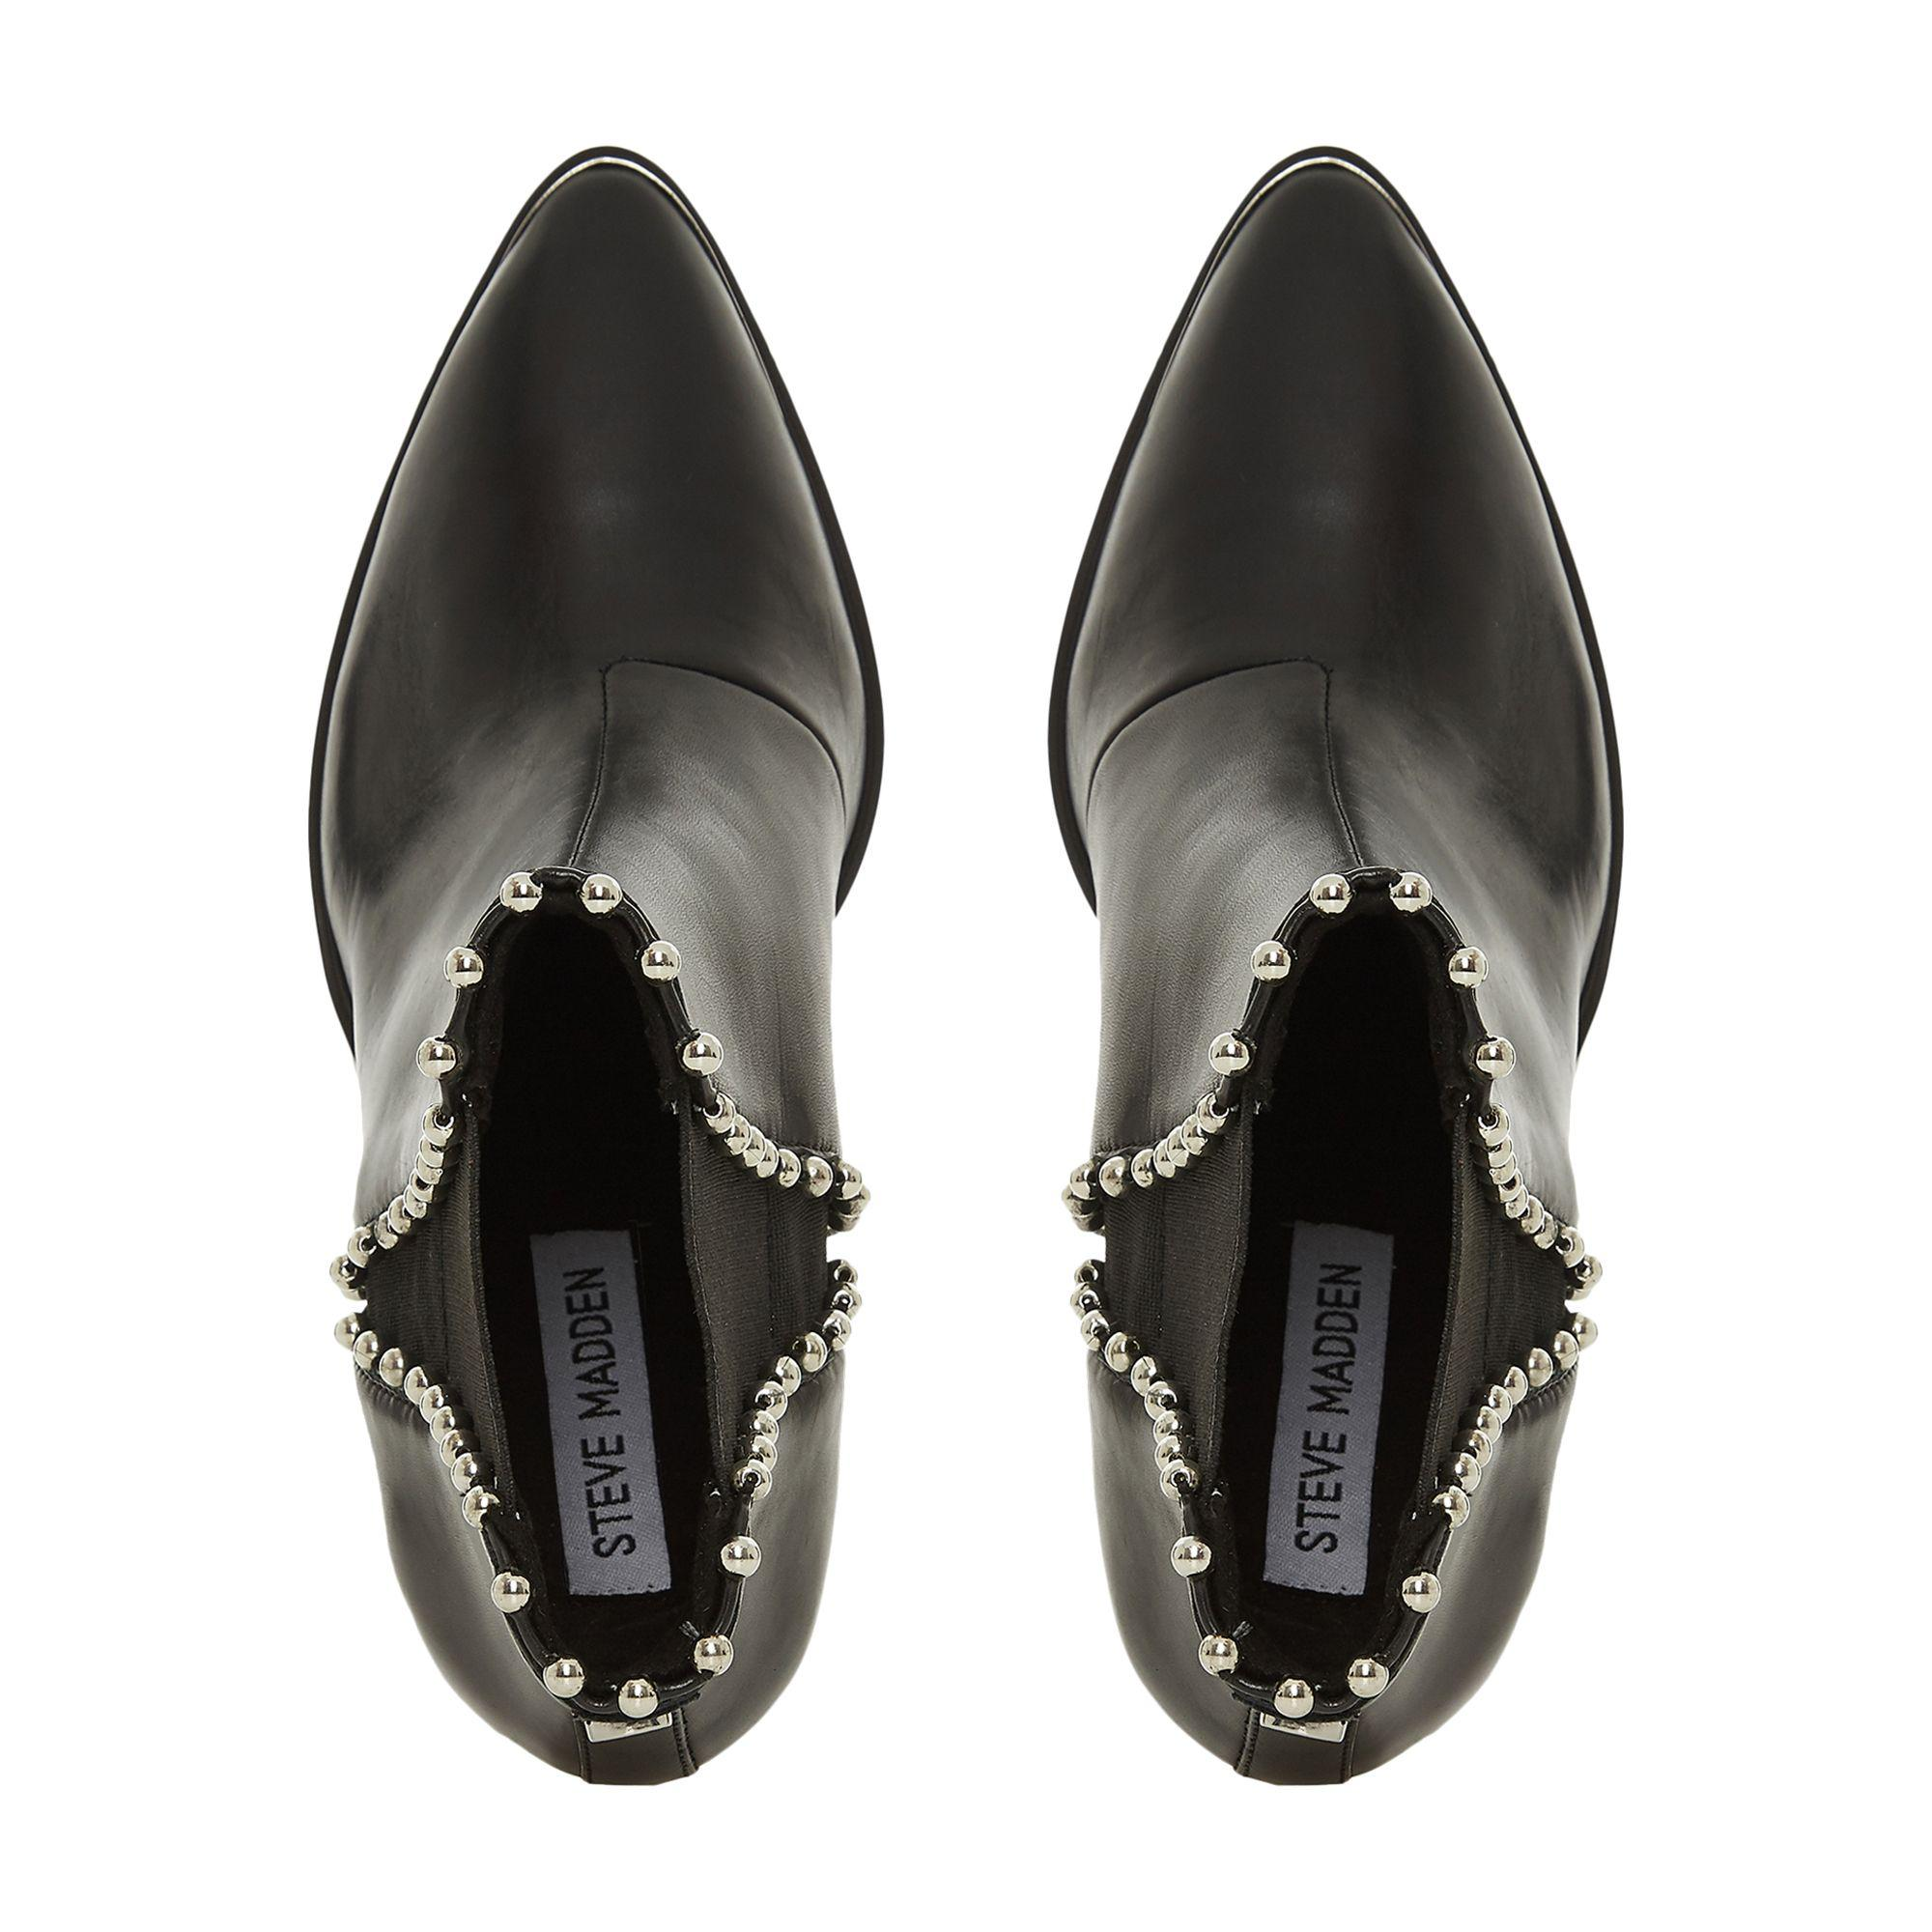 b31750b7675 Steve Madden - Black Leather  himmer   Block Heel Ankle Boots - Lyst. View  fullscreen